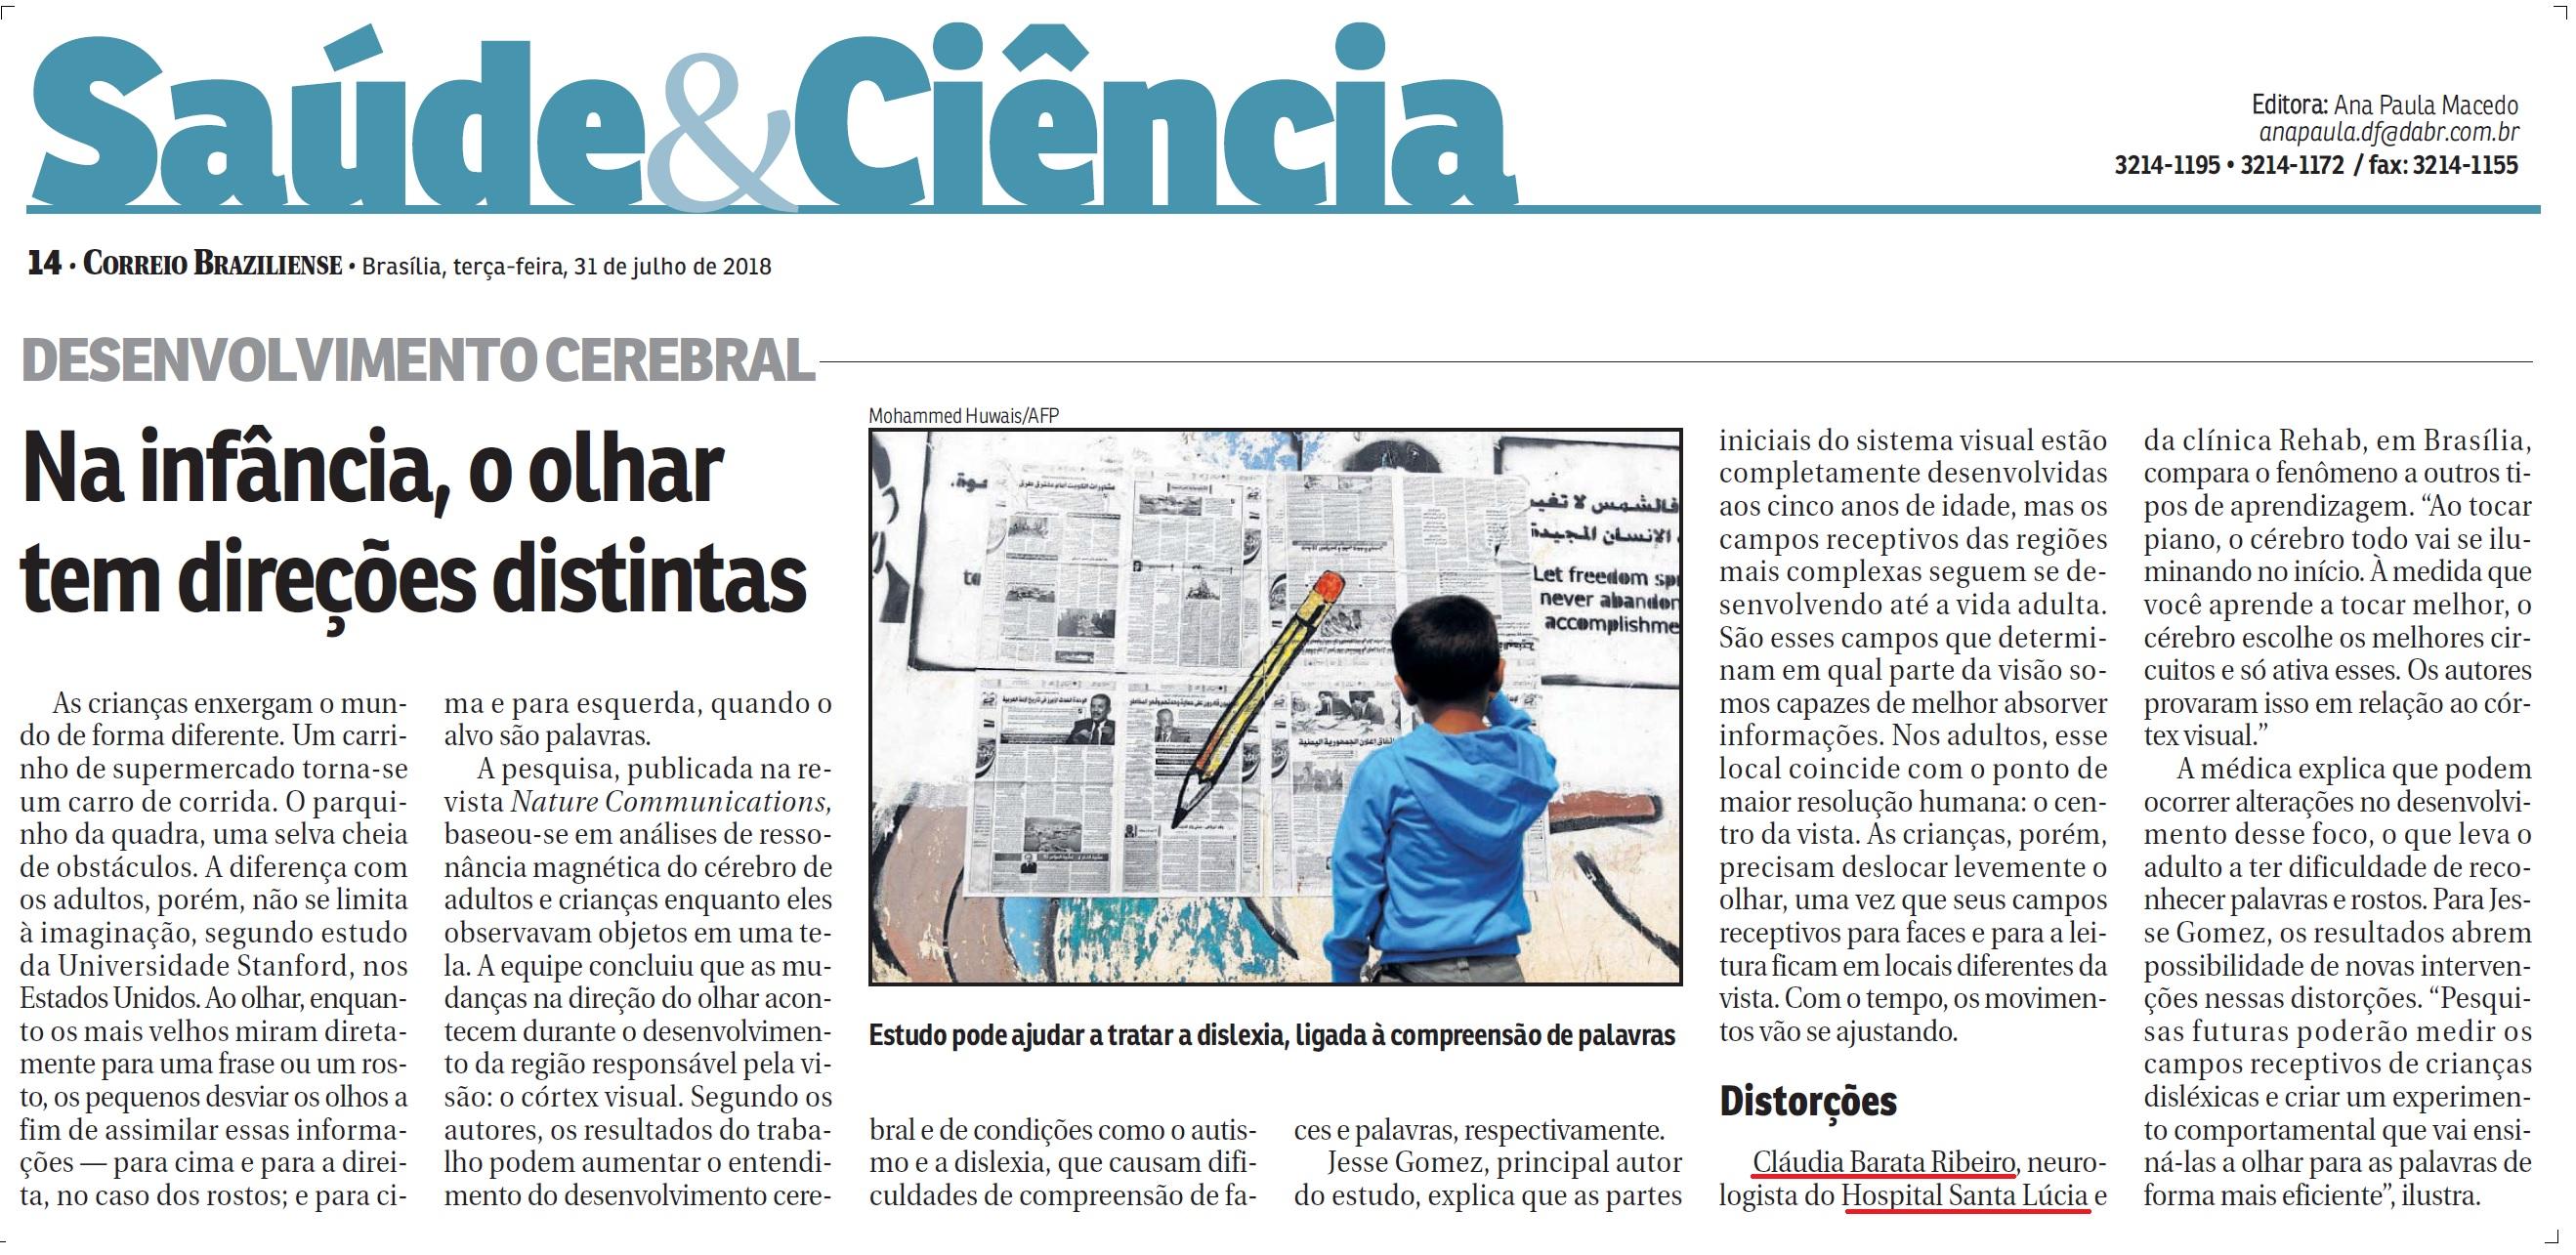 Correio Braziliense - Dra. Cláudia Barata Ribeiro HSLS - 31-07-2018